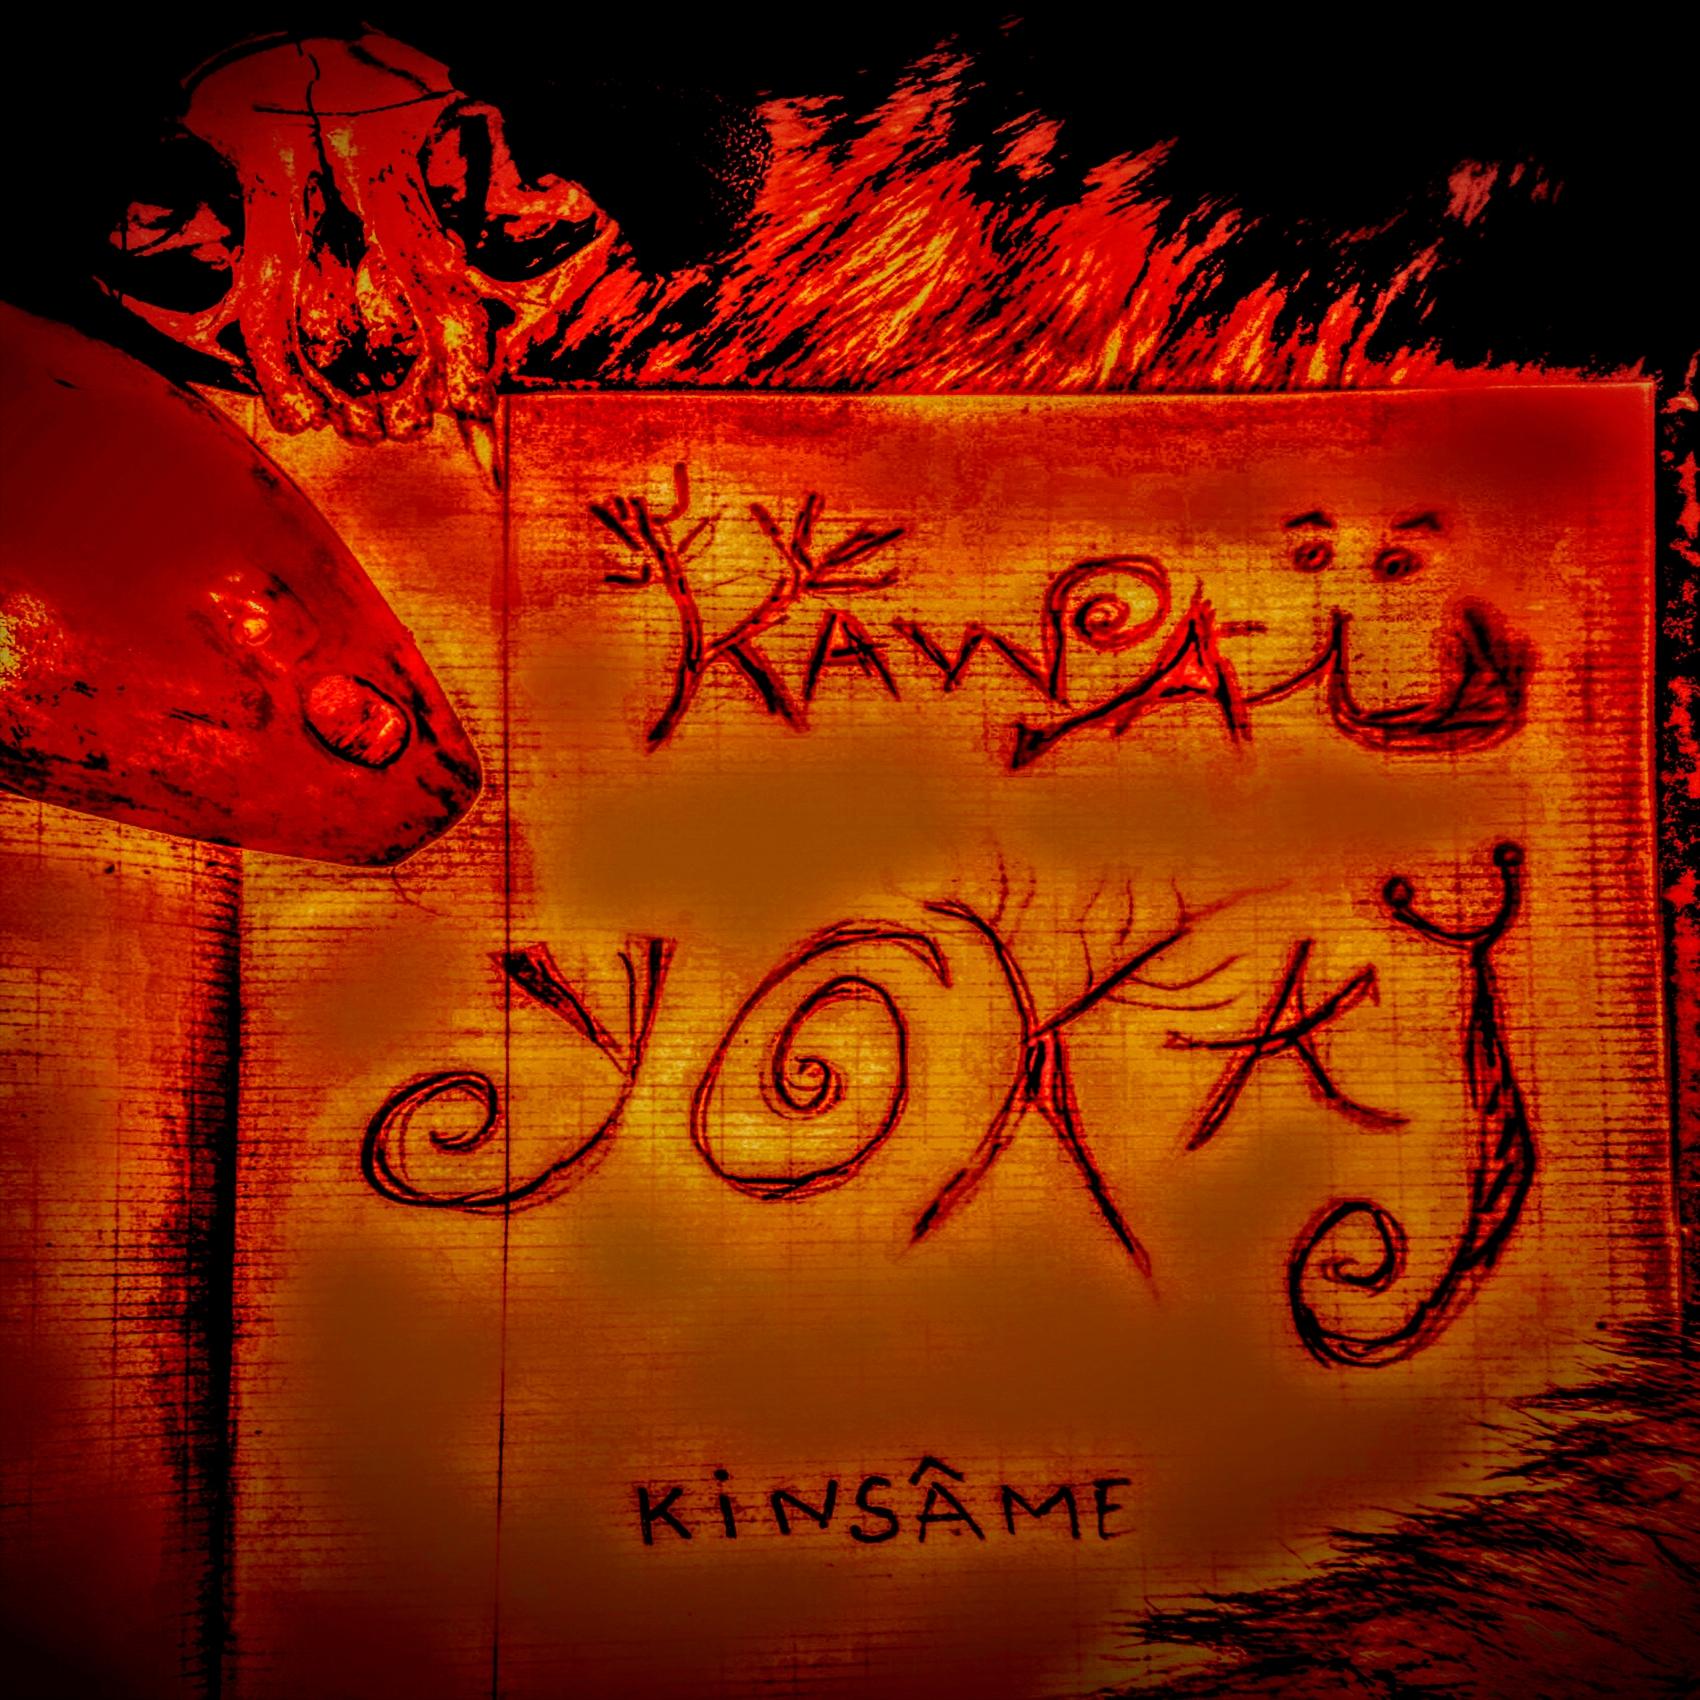 Kinsâme - Kawai Yokai listen/fr - creativecommonsmusic | ello